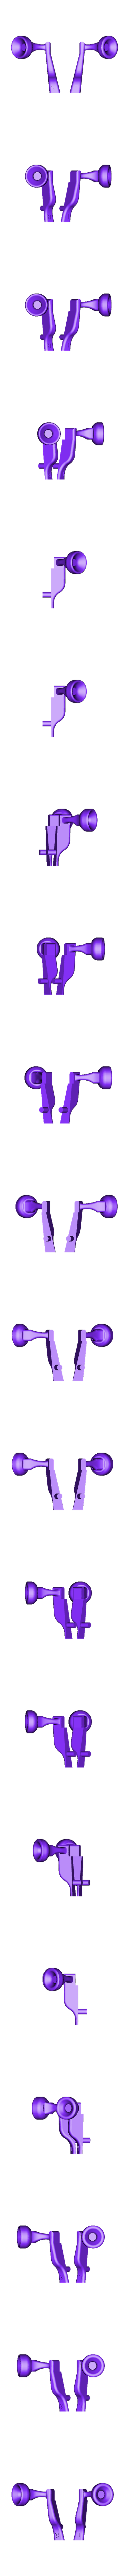 shrek_tapa_COVID-19 v3.stl Download free STL file Covid-19 headband protector • 3D printing object, amilkarsp